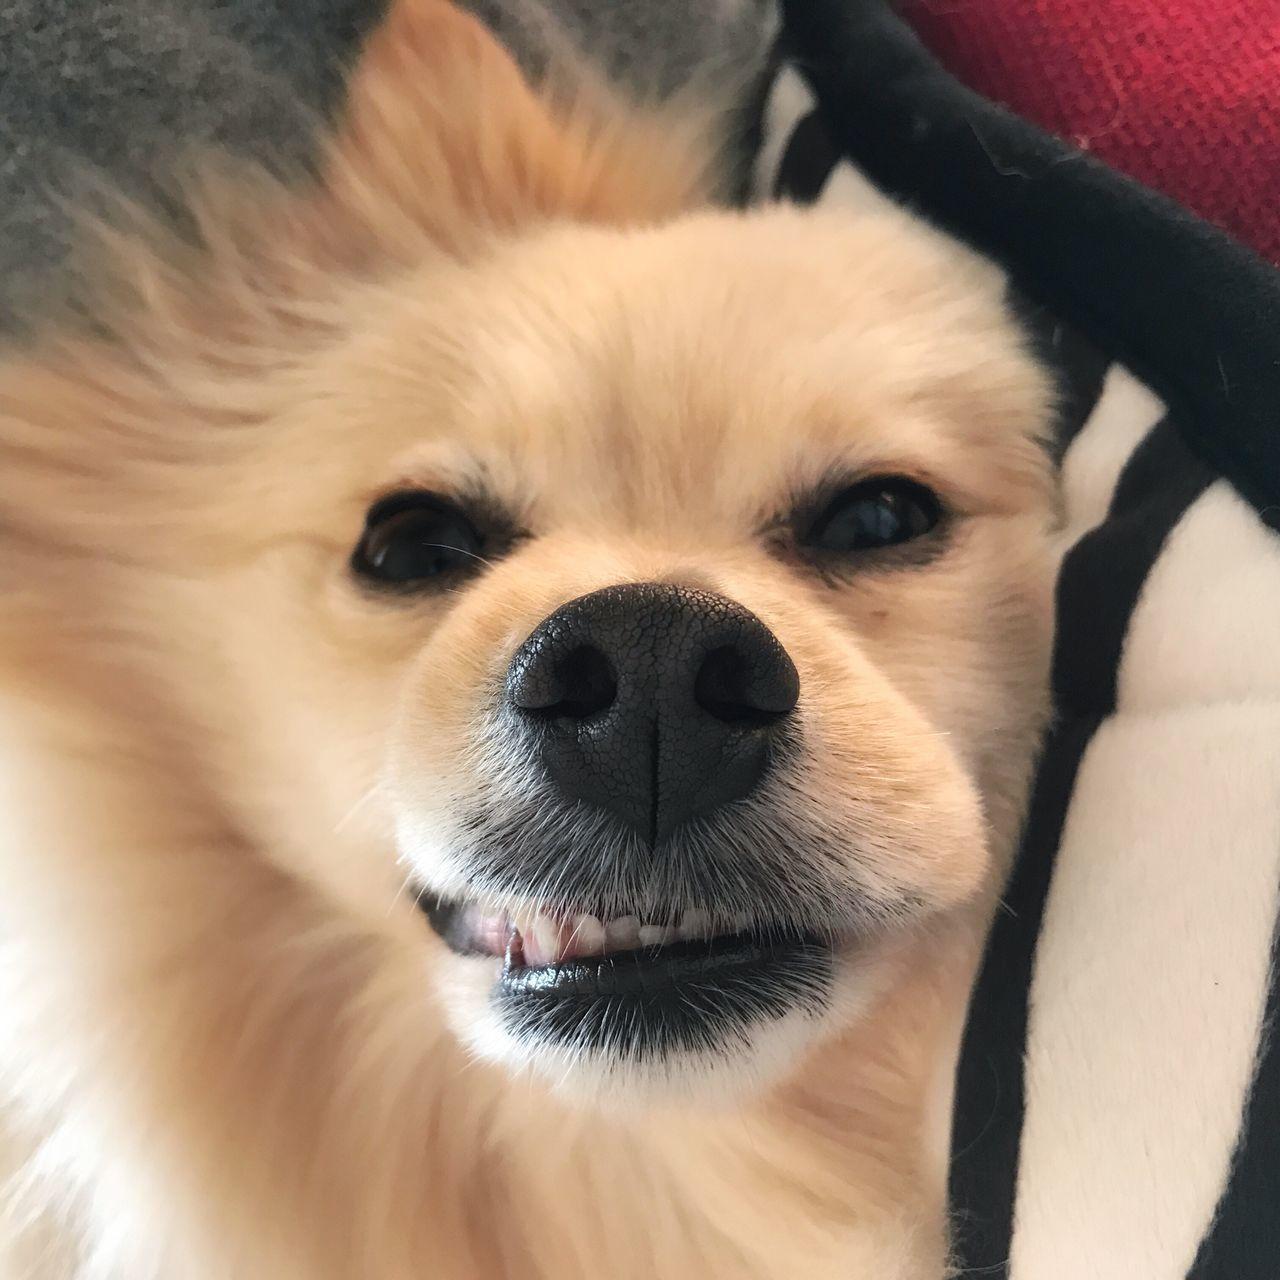 Pomeranian ポメラニアン Pomeranianlove Pomeranian Love Pomeranians Rico ブサかわ 可愛い Pets Dog Cute